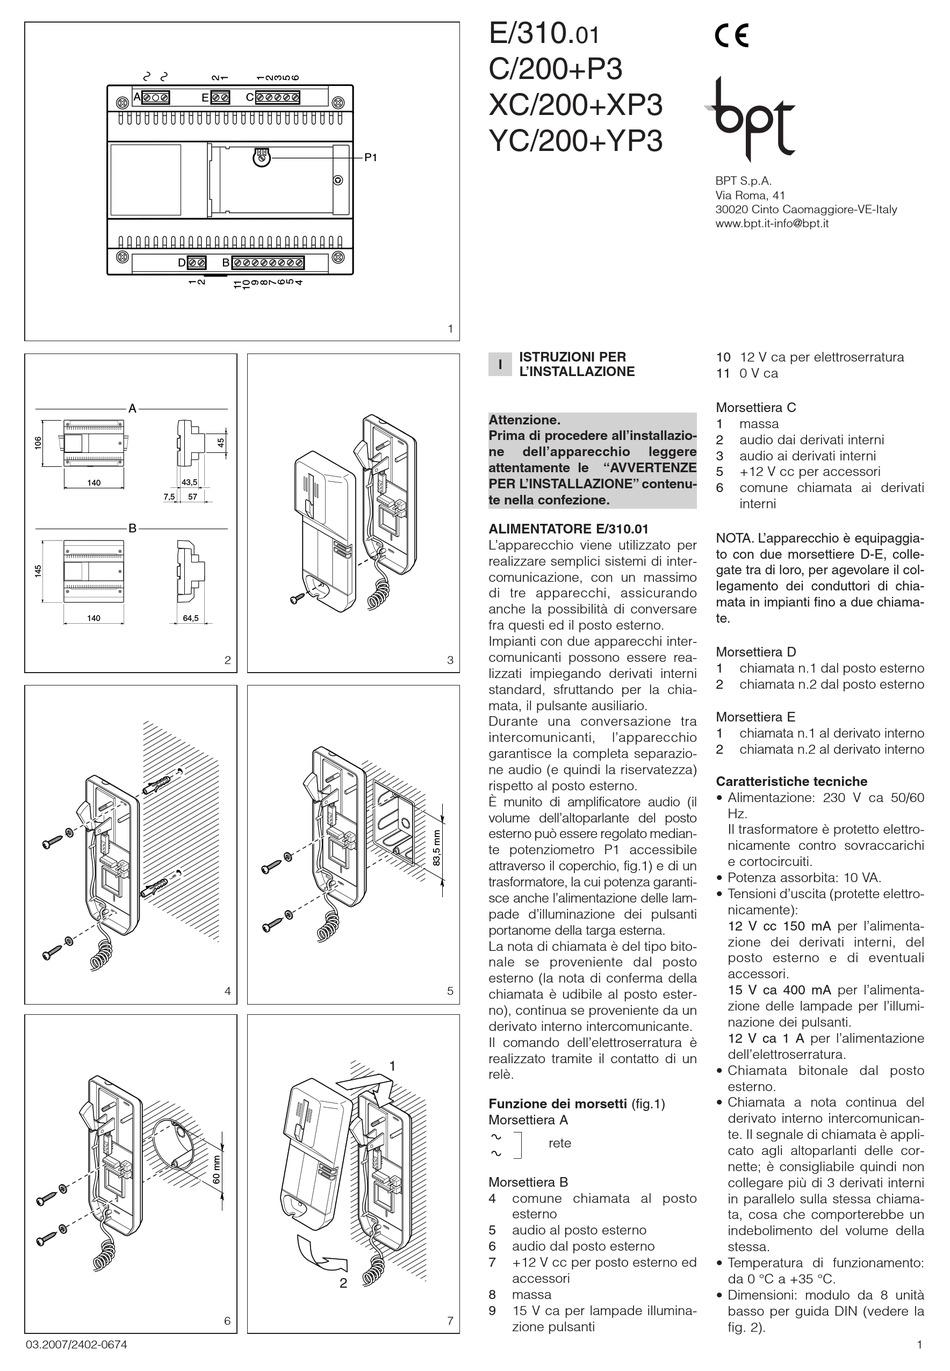 BPT E/310.01 INSTALLATION INSTRUCTIONS MANUAL Pdf Download